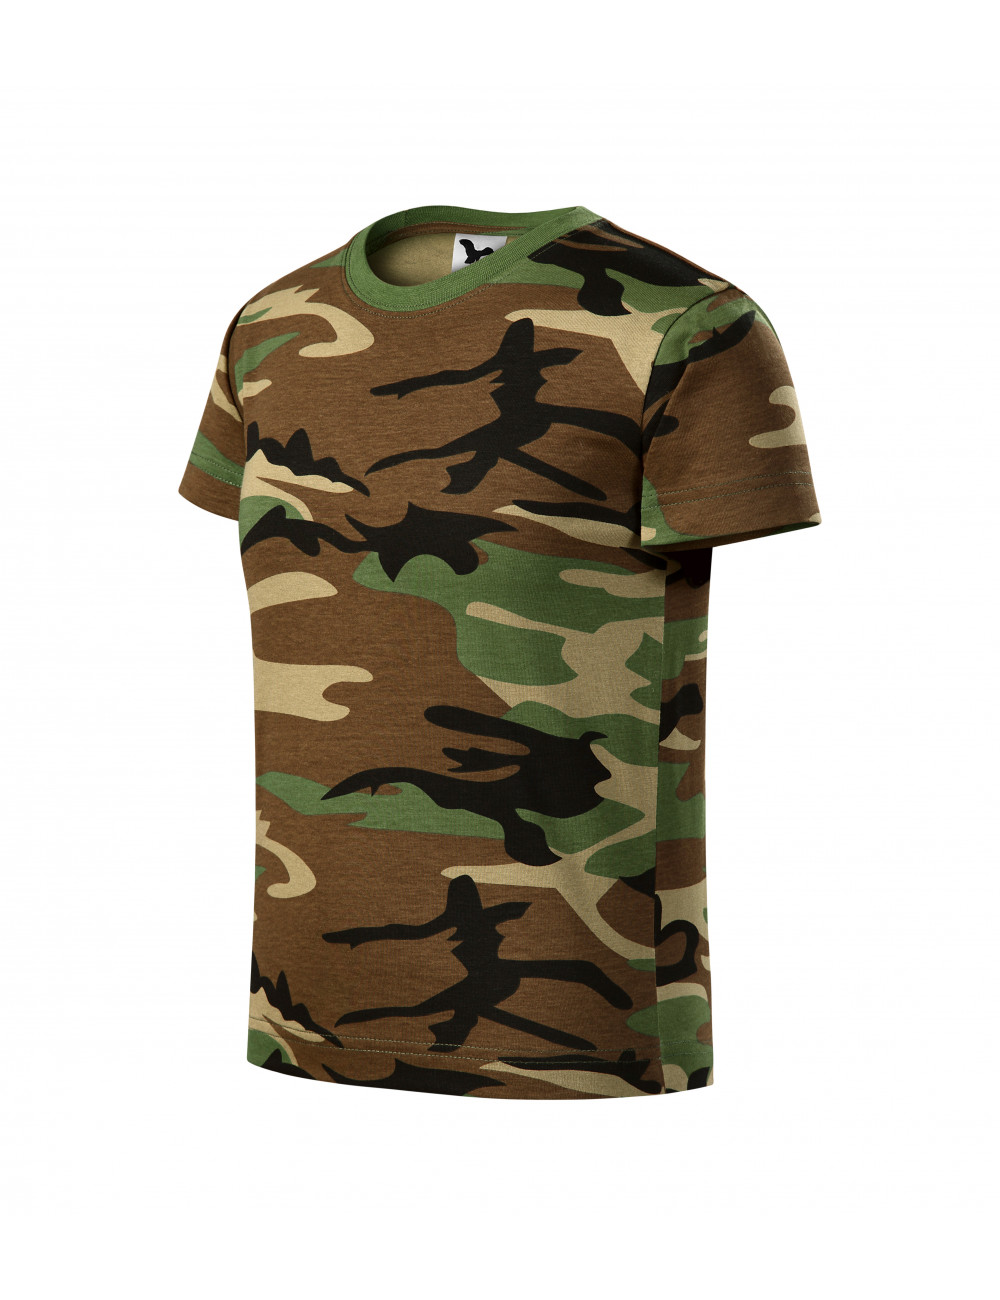 Adler MALFINI Koszulka dziecięca Camouflage 149 camouflage brown